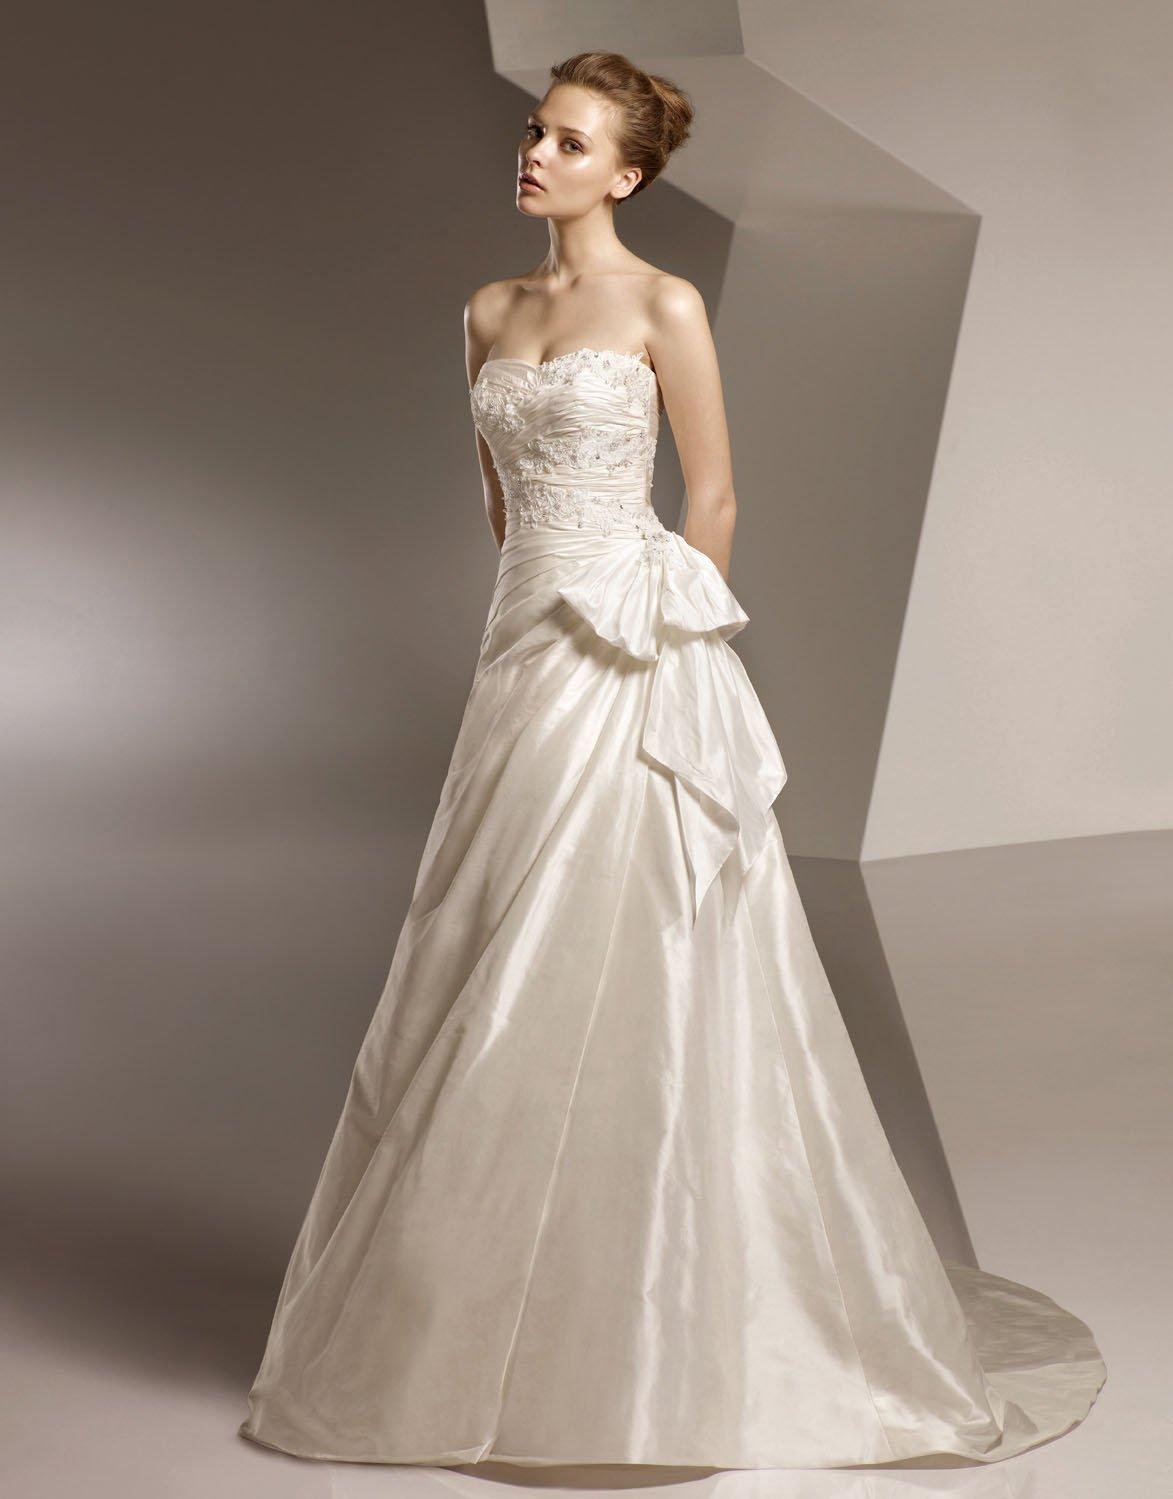 Sweetheart Appliqued Beading Taffeta Wedding Dress Bridal Gown aq0024